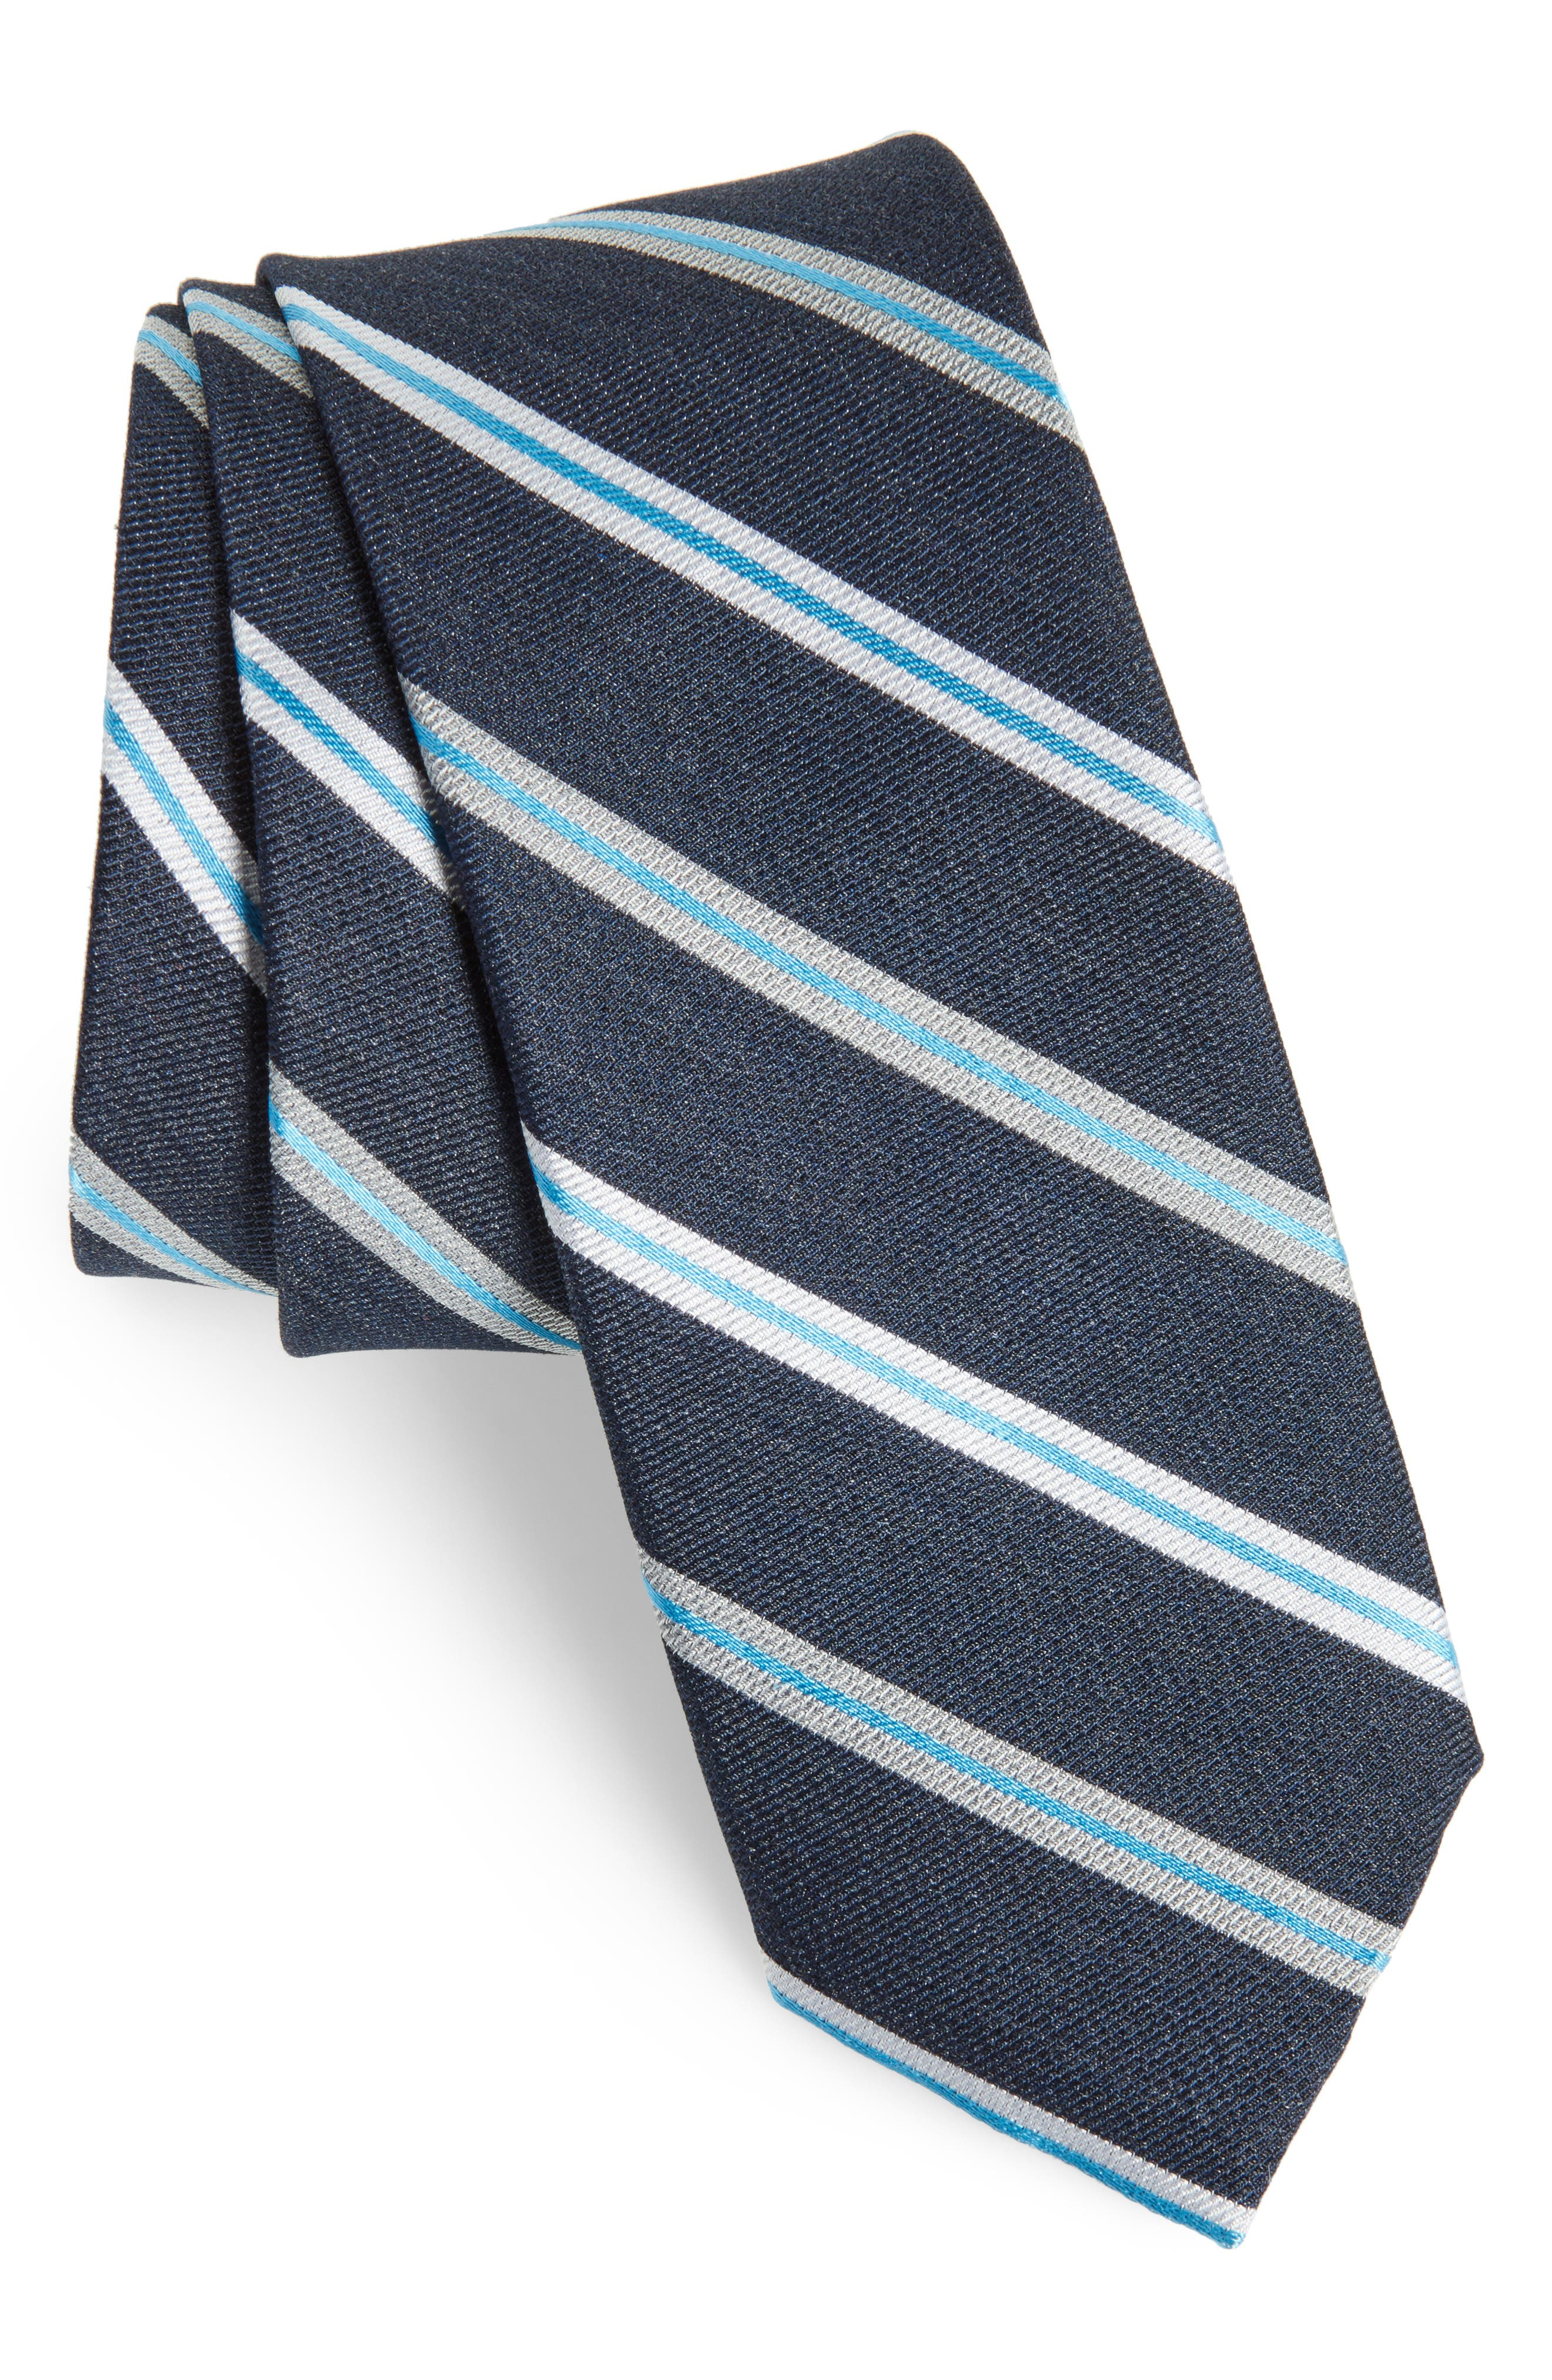 Alternate Image 1 Selected - Nordstrom Men's Shop Crosby Stripe Silk Blend Tie